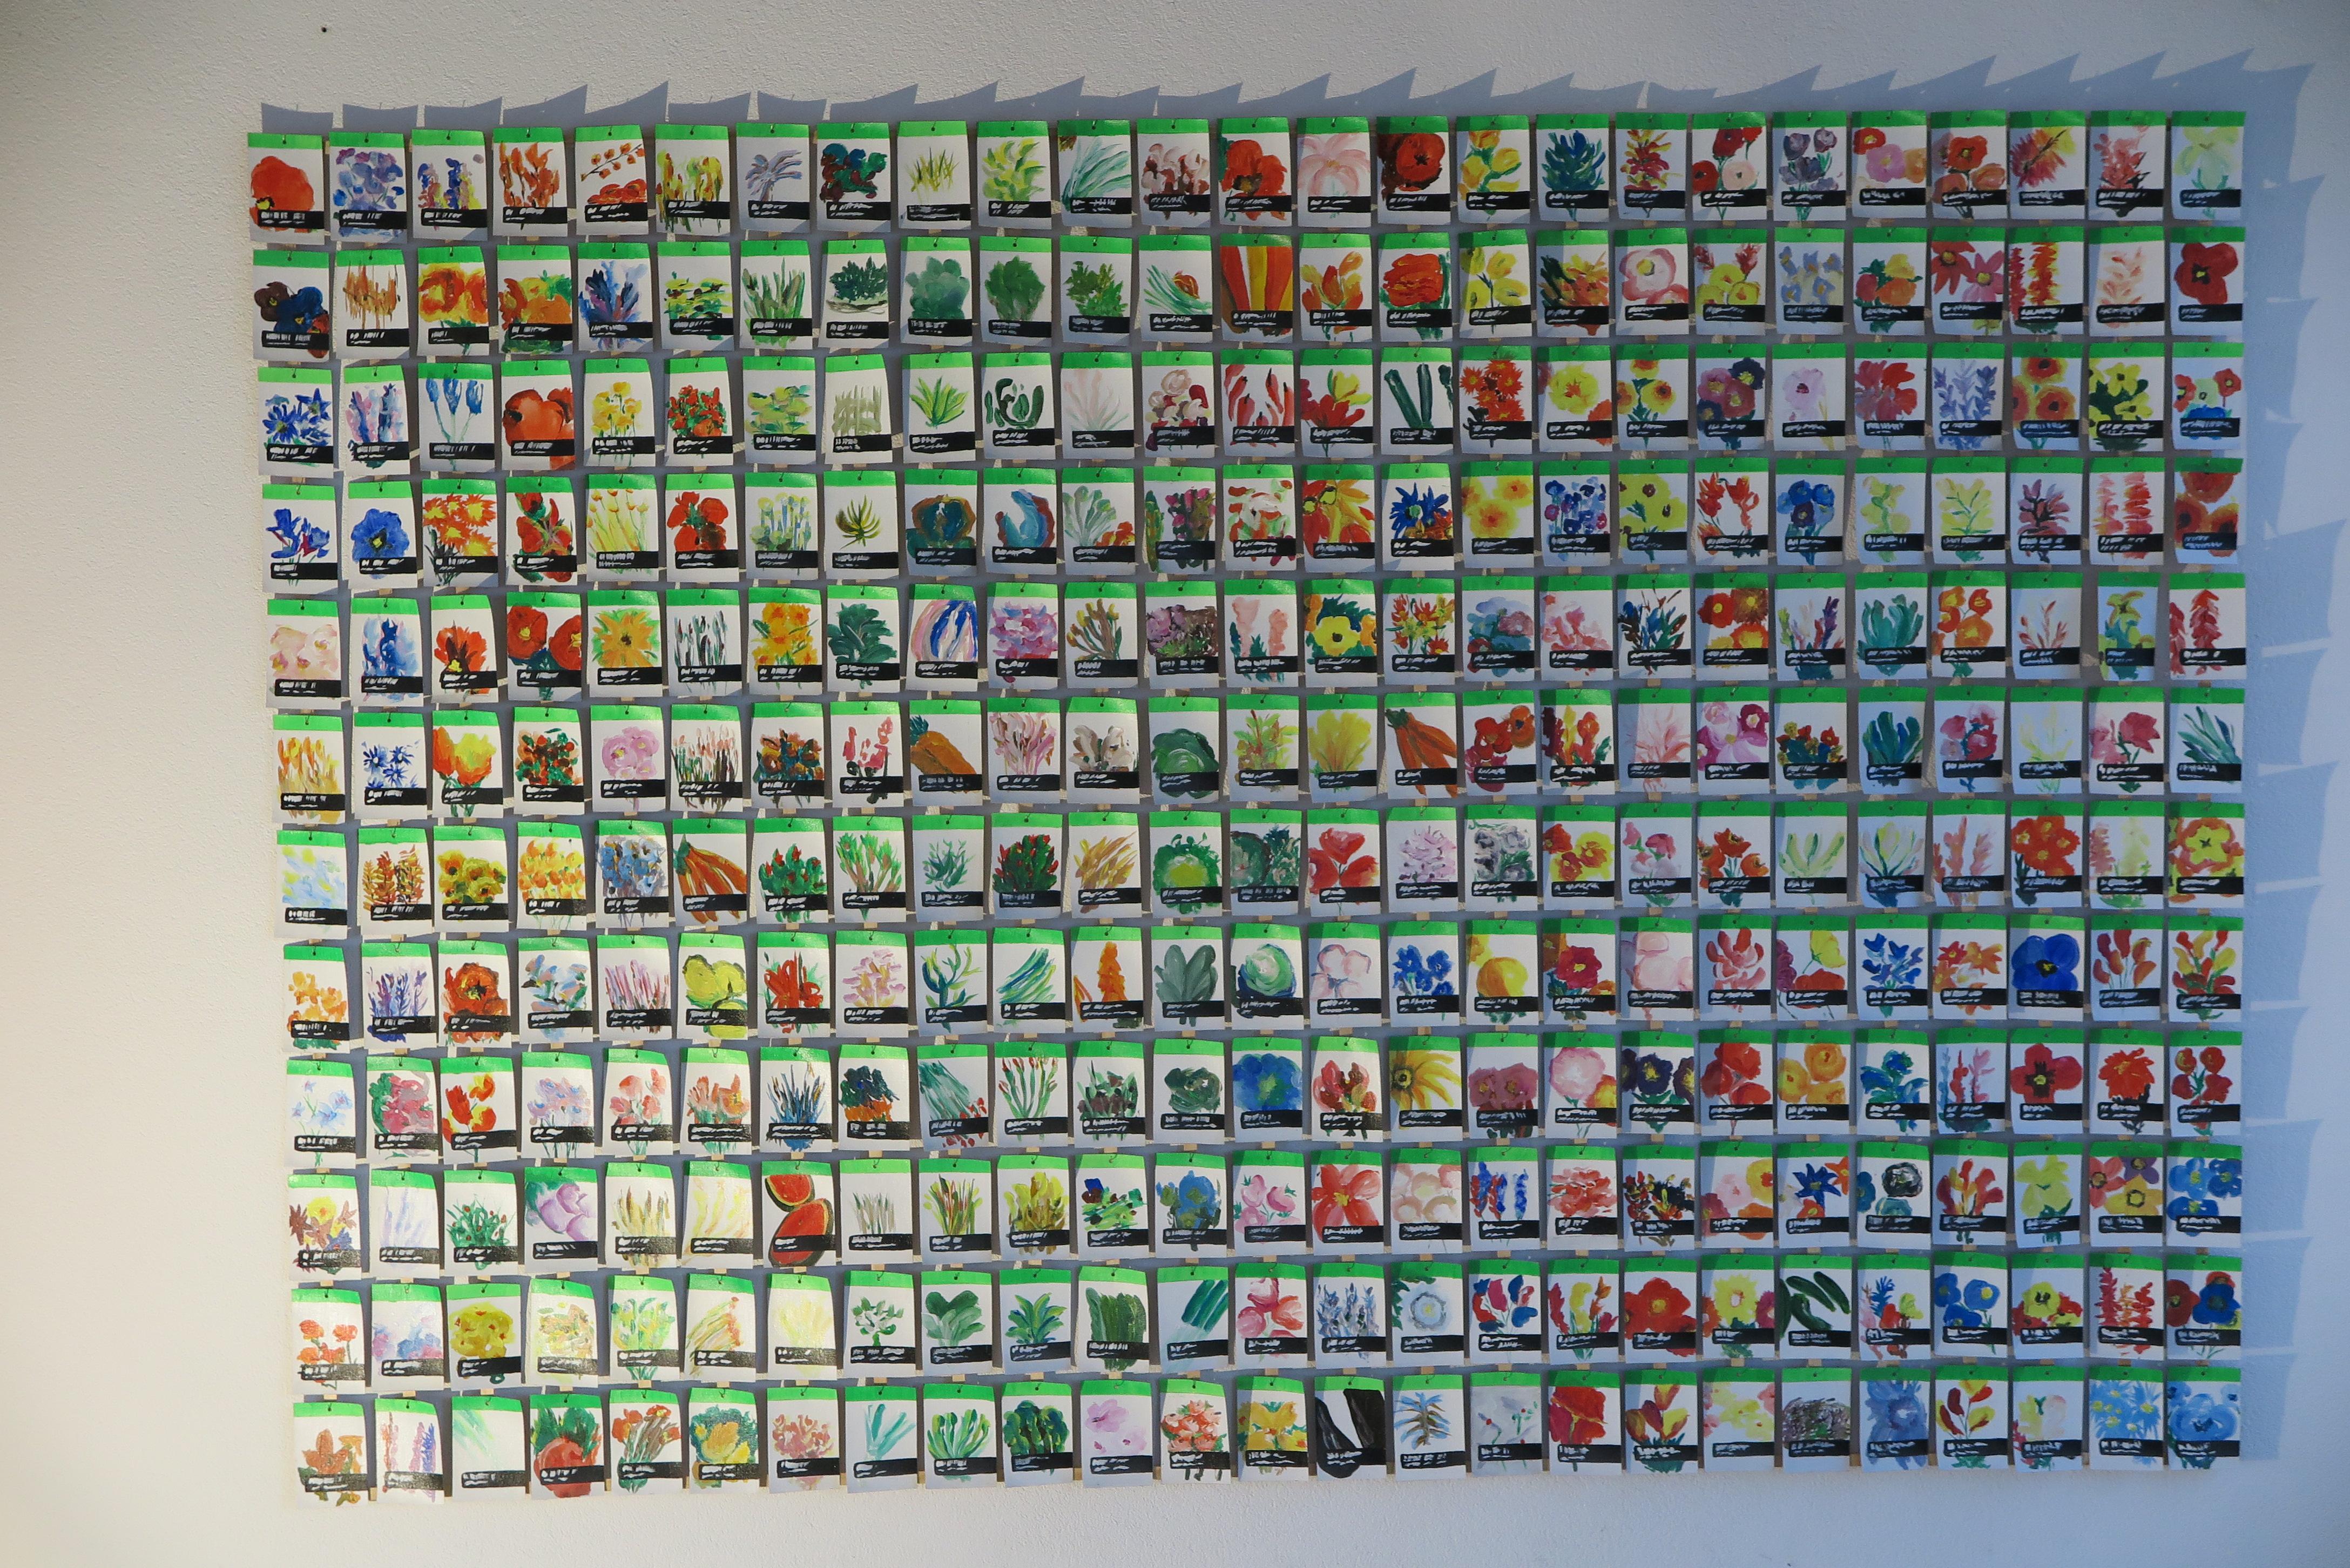 Still life - Maze de Boer - 2012